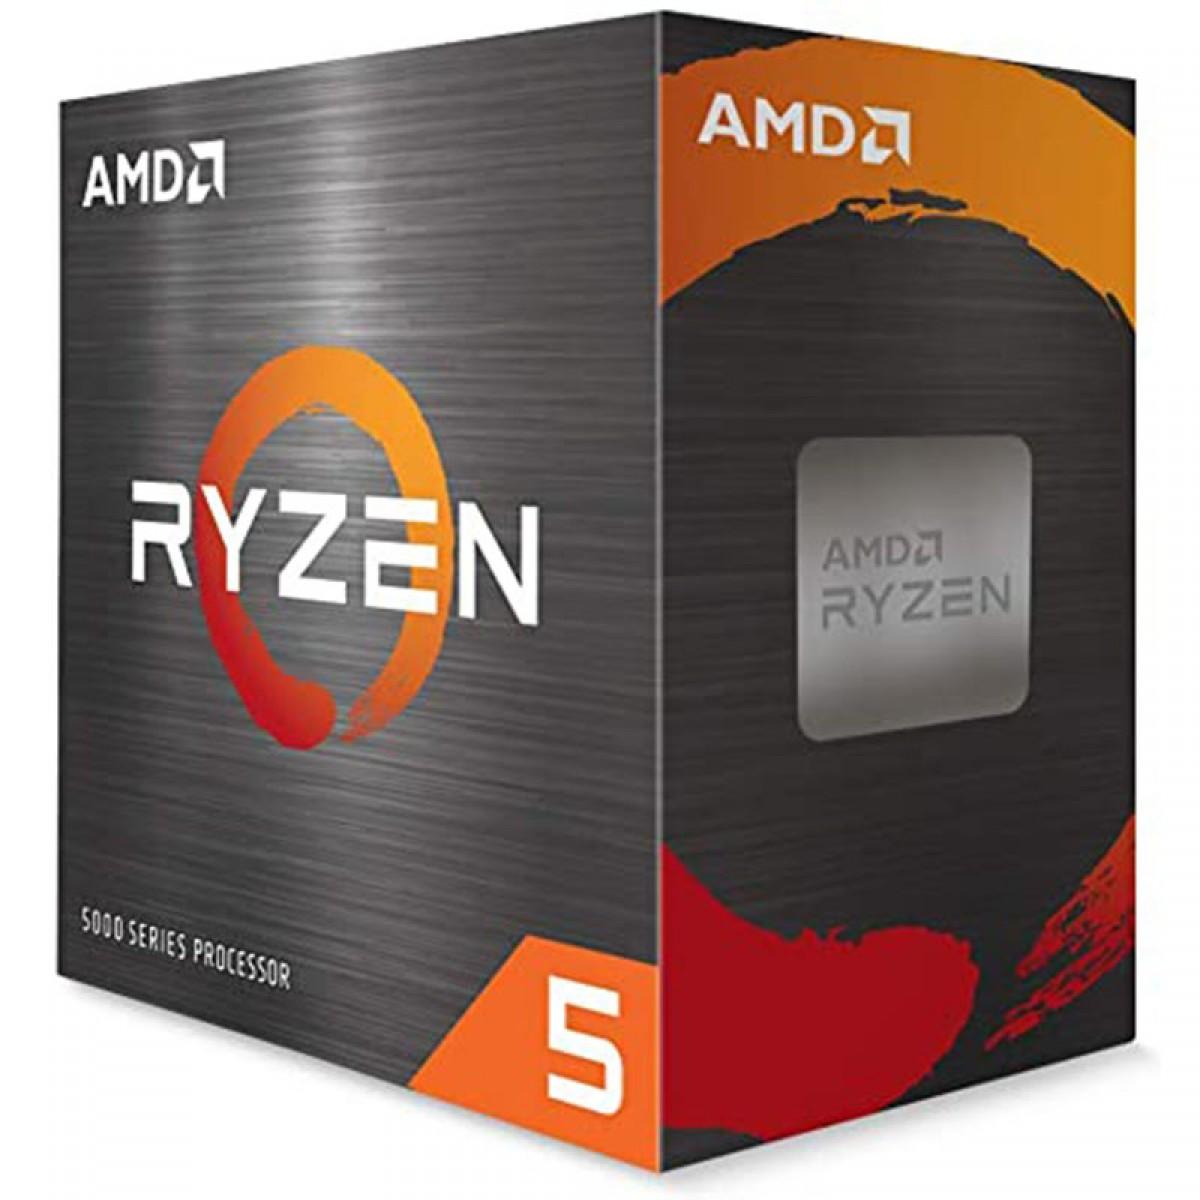 Kit Upgrade, Asus Prime B450M Gaming/BR + AMD Ryzen 5 5600G + Memória DDR4, 8GB/3000MHz